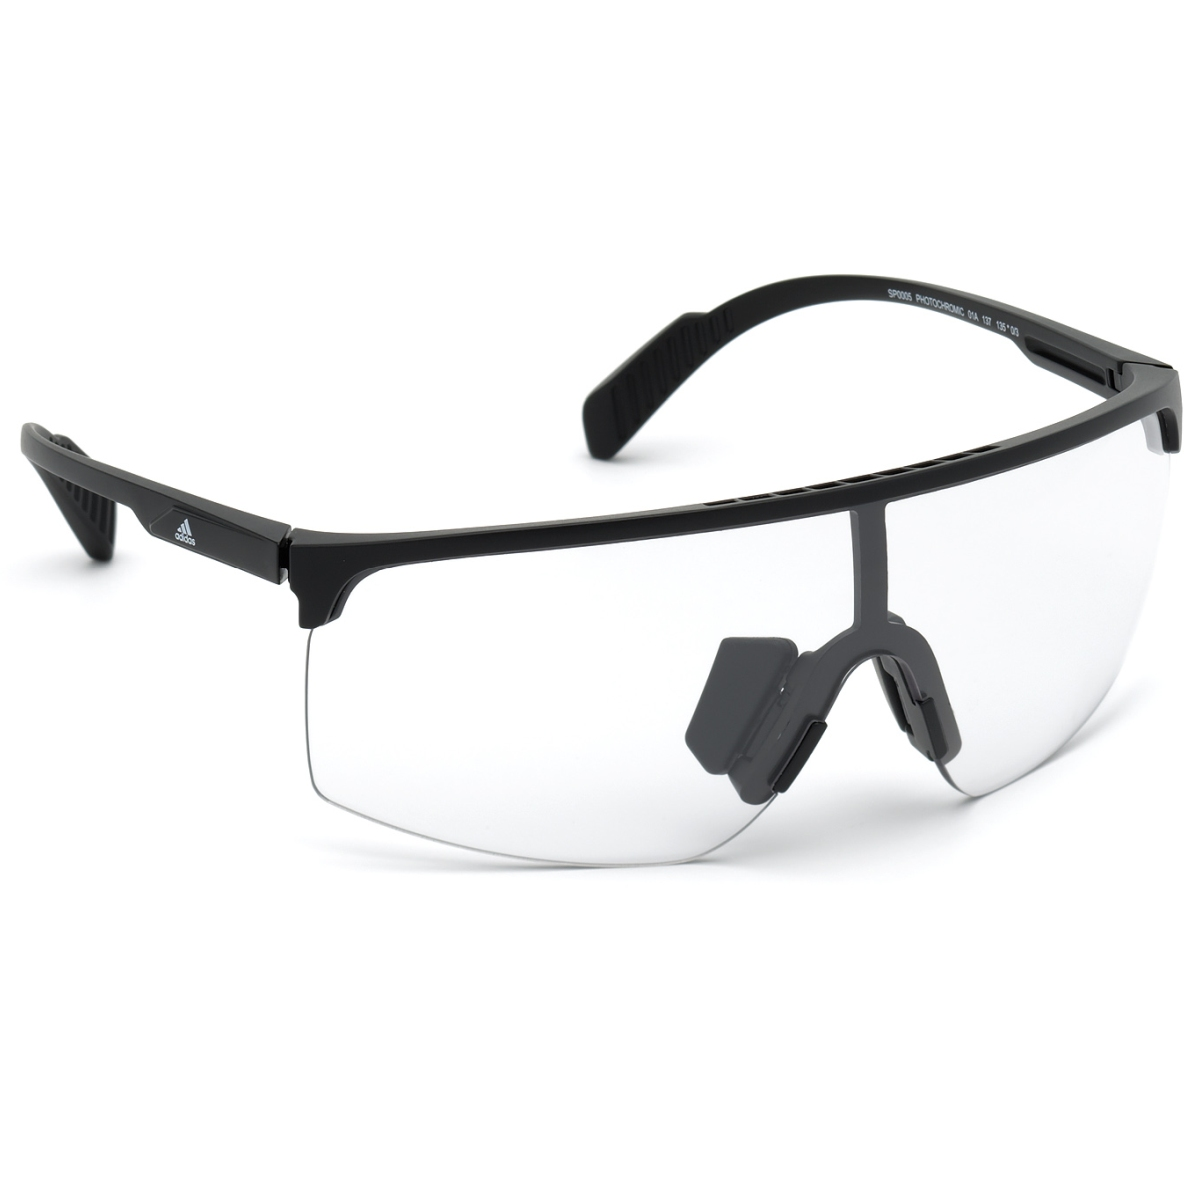 adidas Sp0005 Injected Gafas del Sol Sport - Shiny Black / Vario Crystal